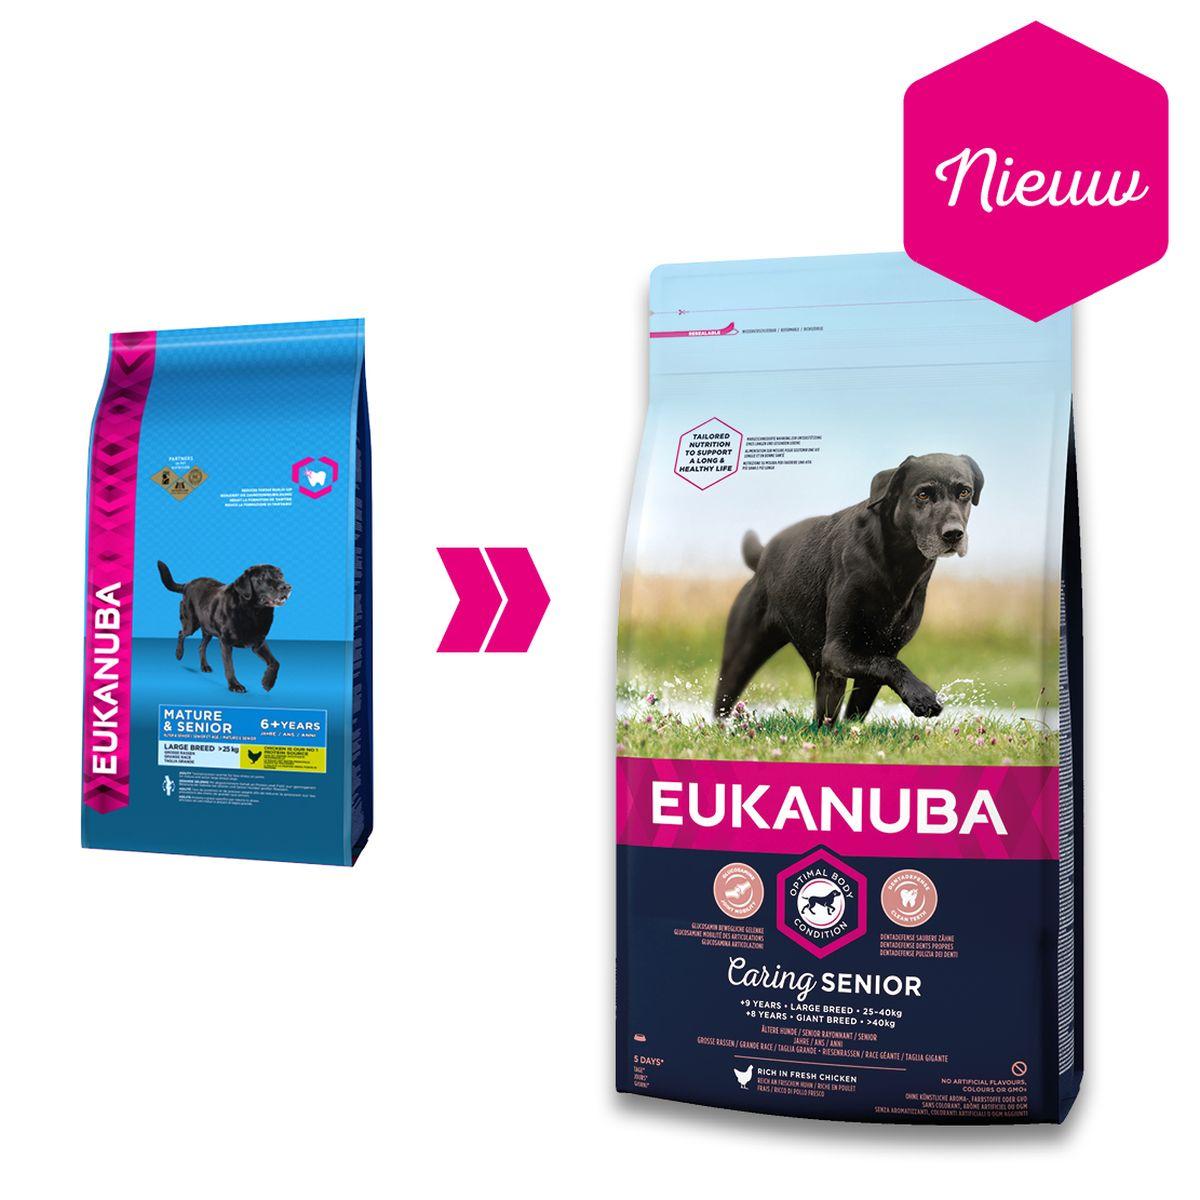 Eukanuba Caring Senior Large Breed Kip 3 kg Hondenvoer